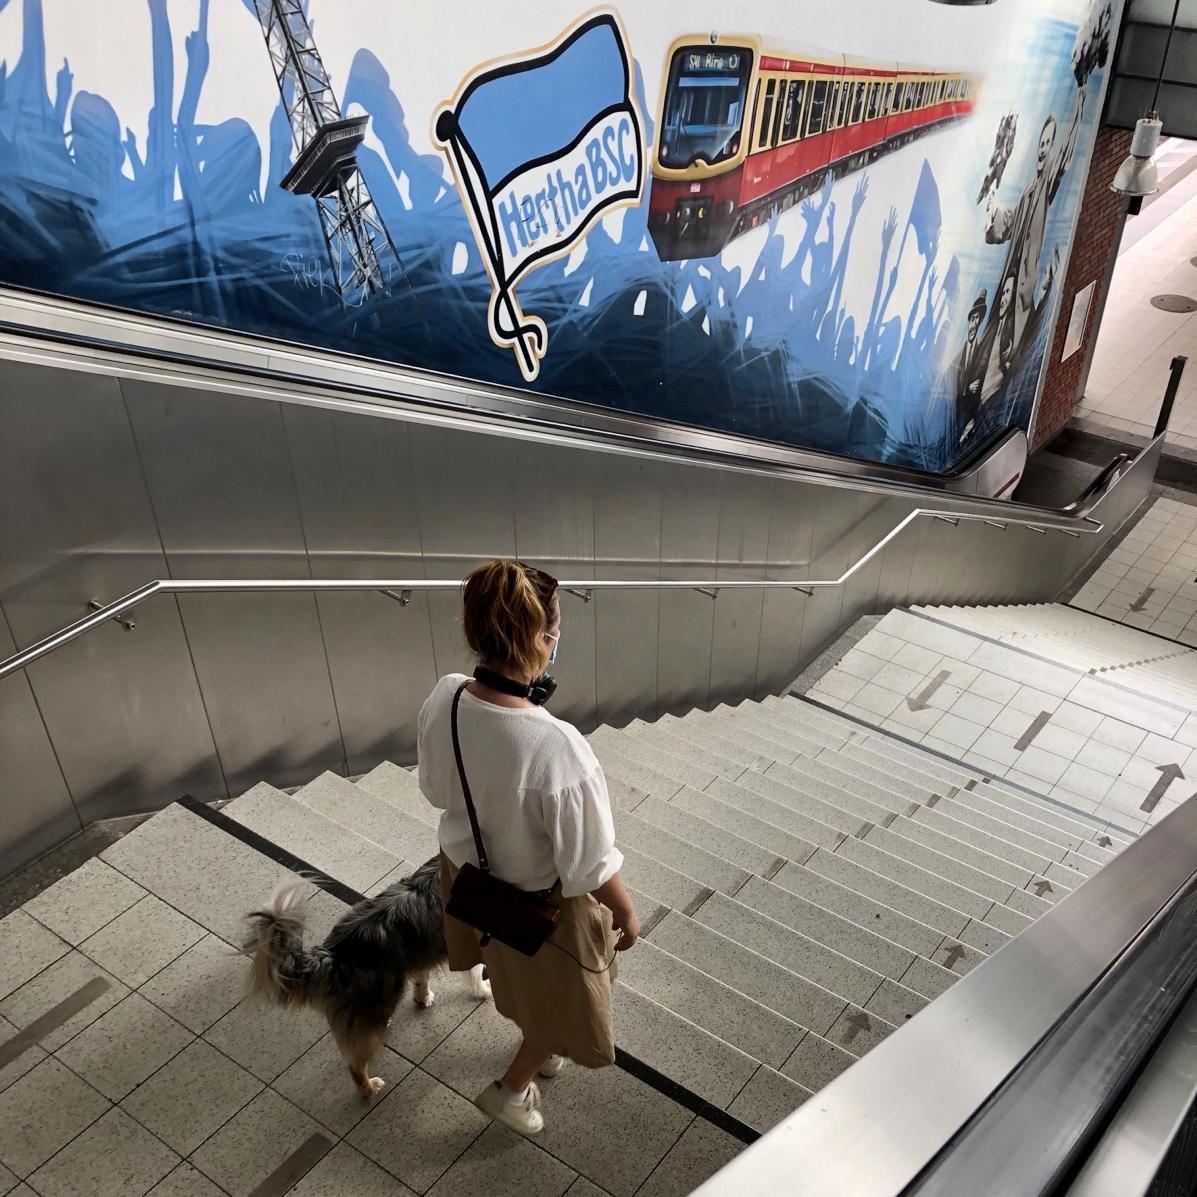 #11 Hochsensibel in der S-Bahn